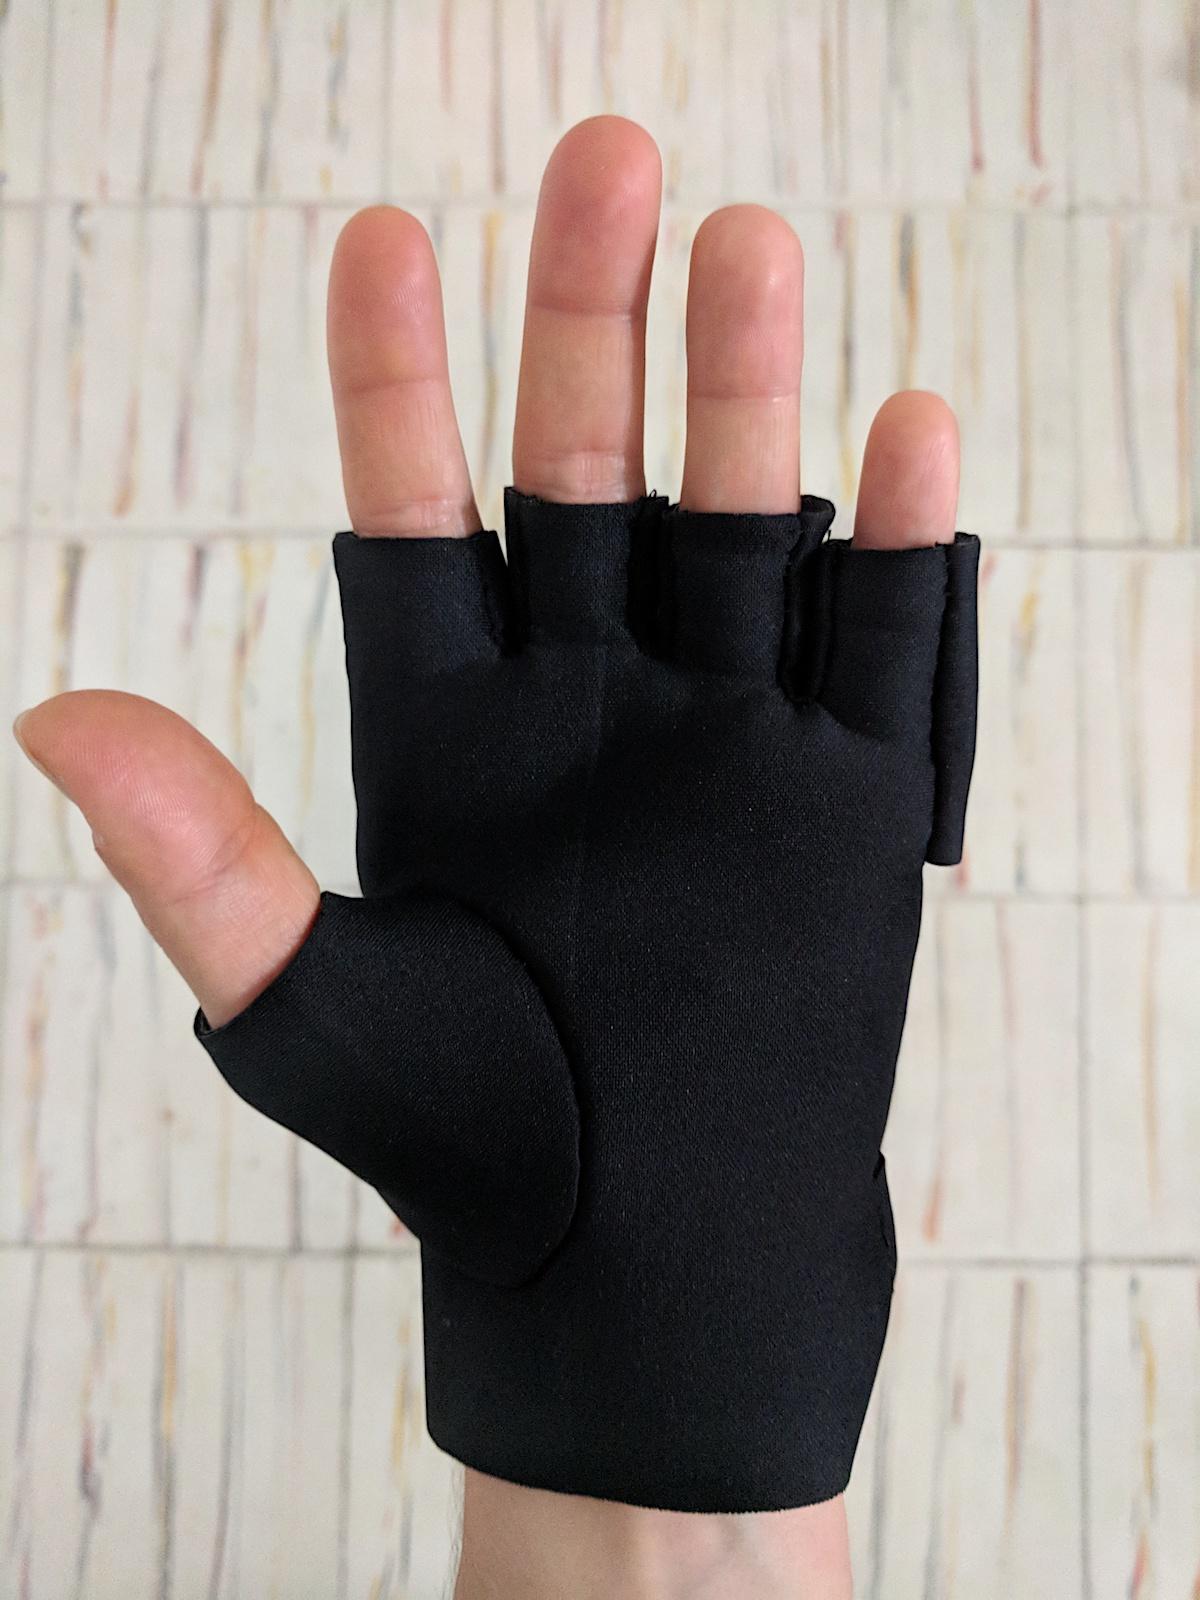 W12_glove hand.jpg